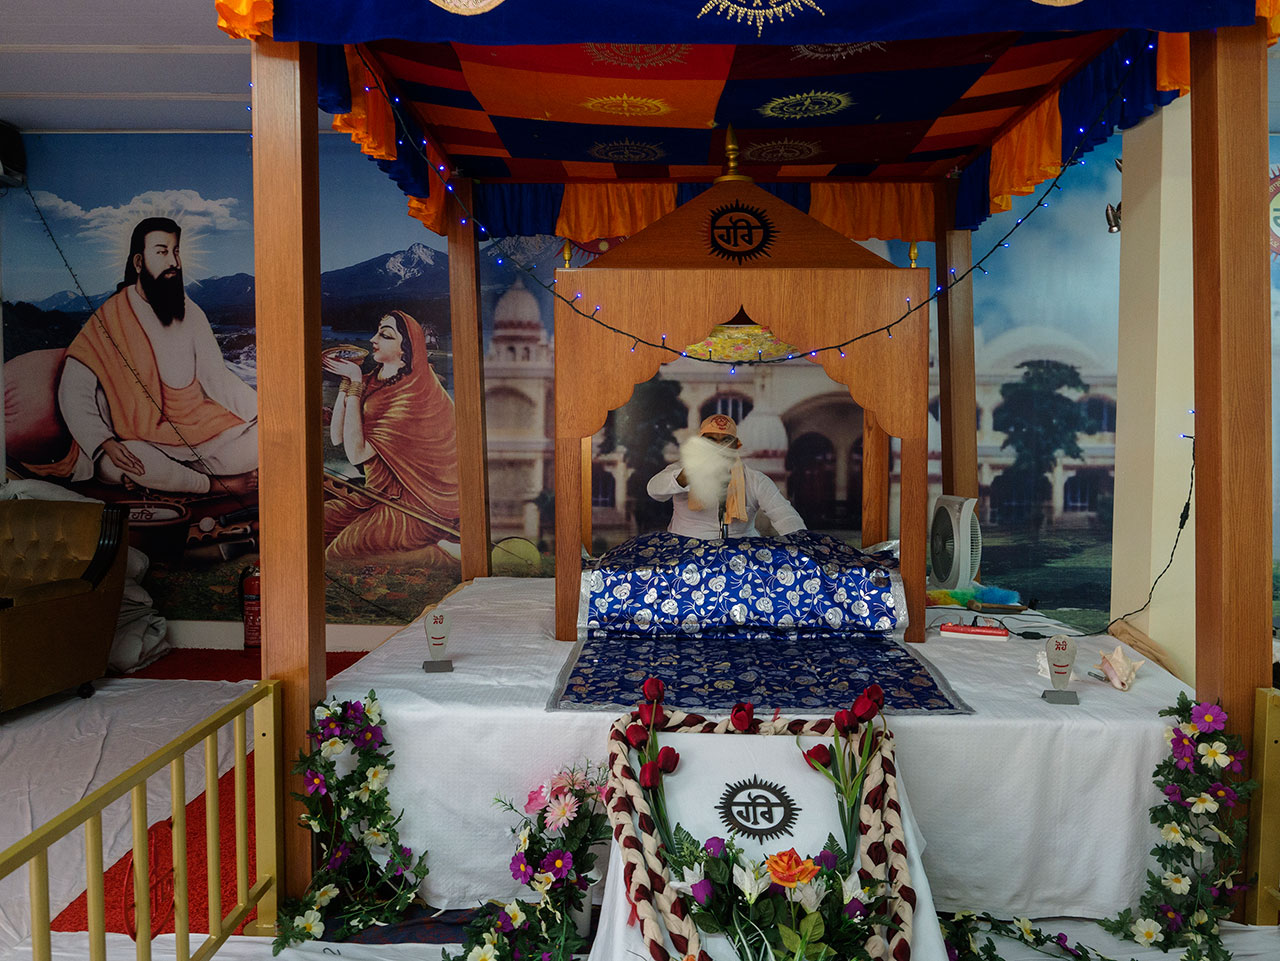 Shri Guru Ravi Dass Sukh Sagar, Menidi© Tassos Vrettos.